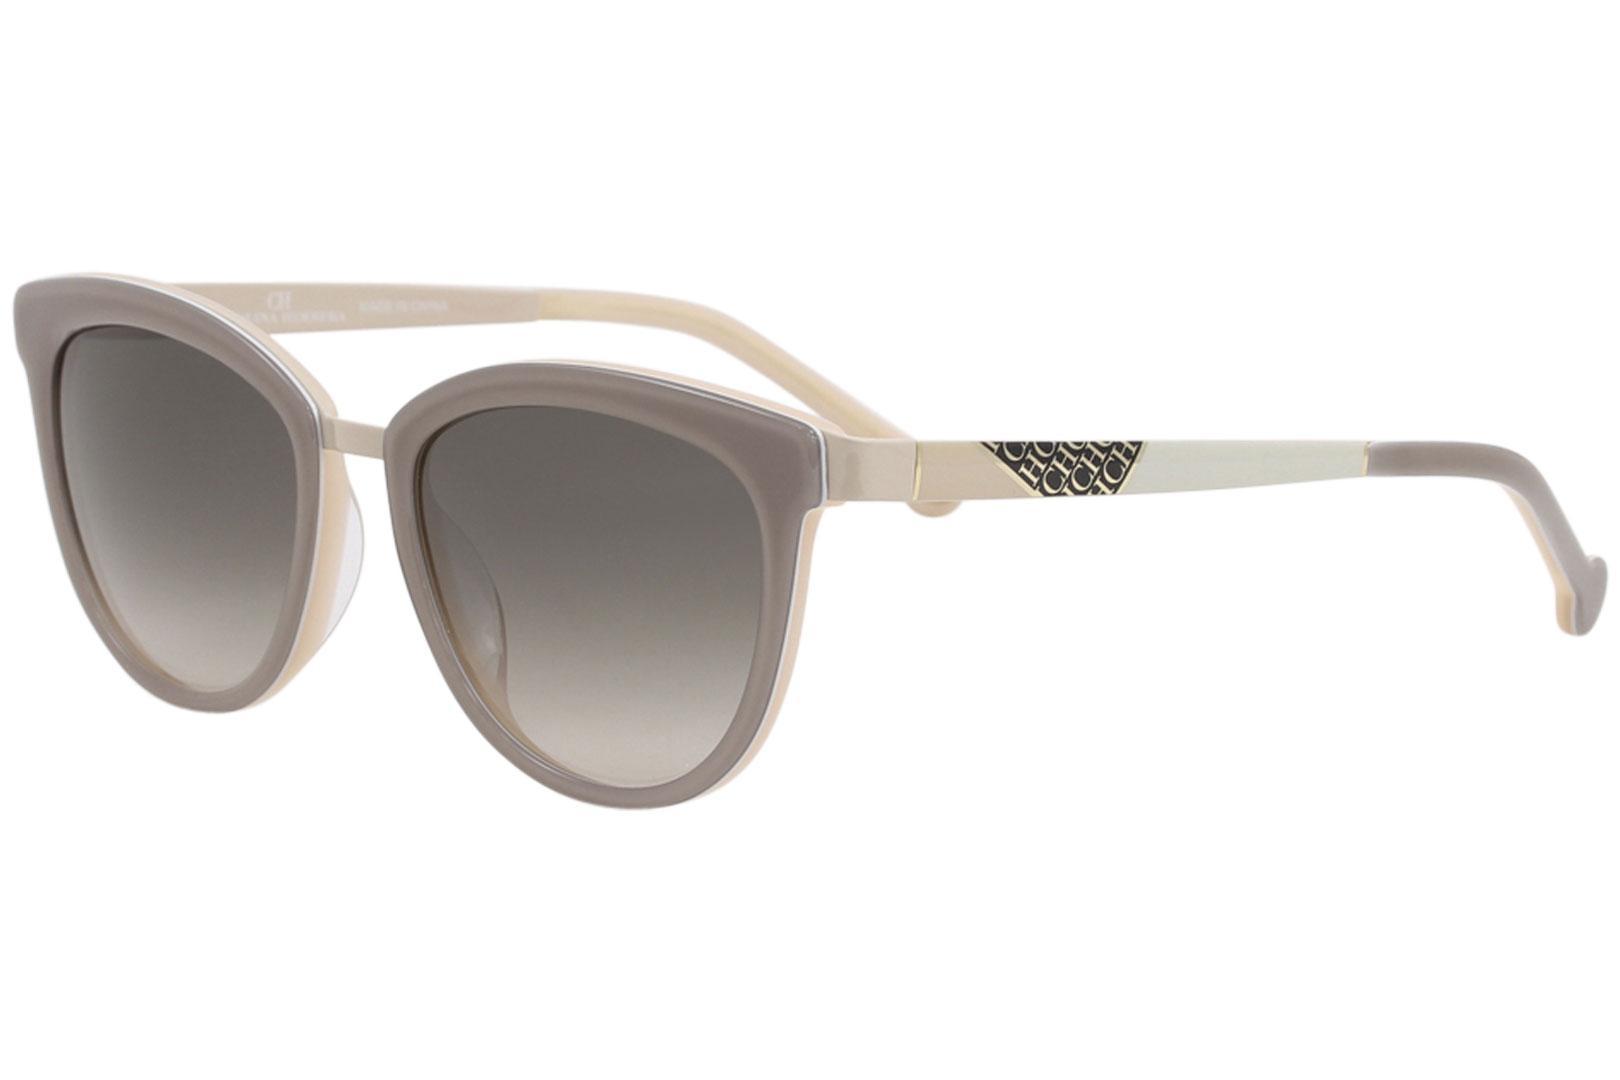 acccdb17f97b8 CH Carolina Herrera Women s SHE748 SHE 748 Fashion Square Sunglasses